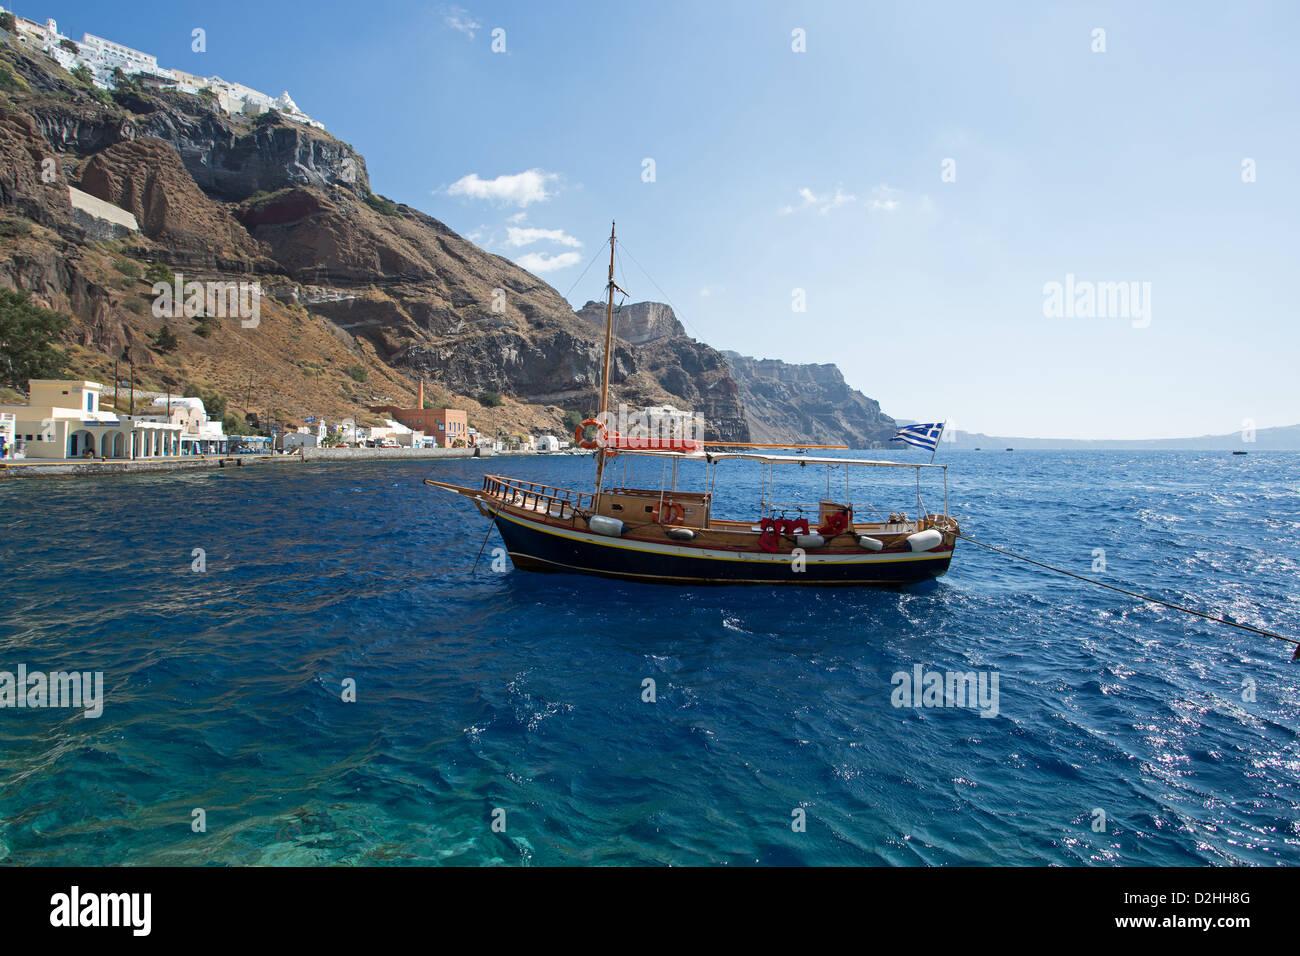 Ormos port at the bottom of Fira, Santorini. Anchored boat - Stock Image